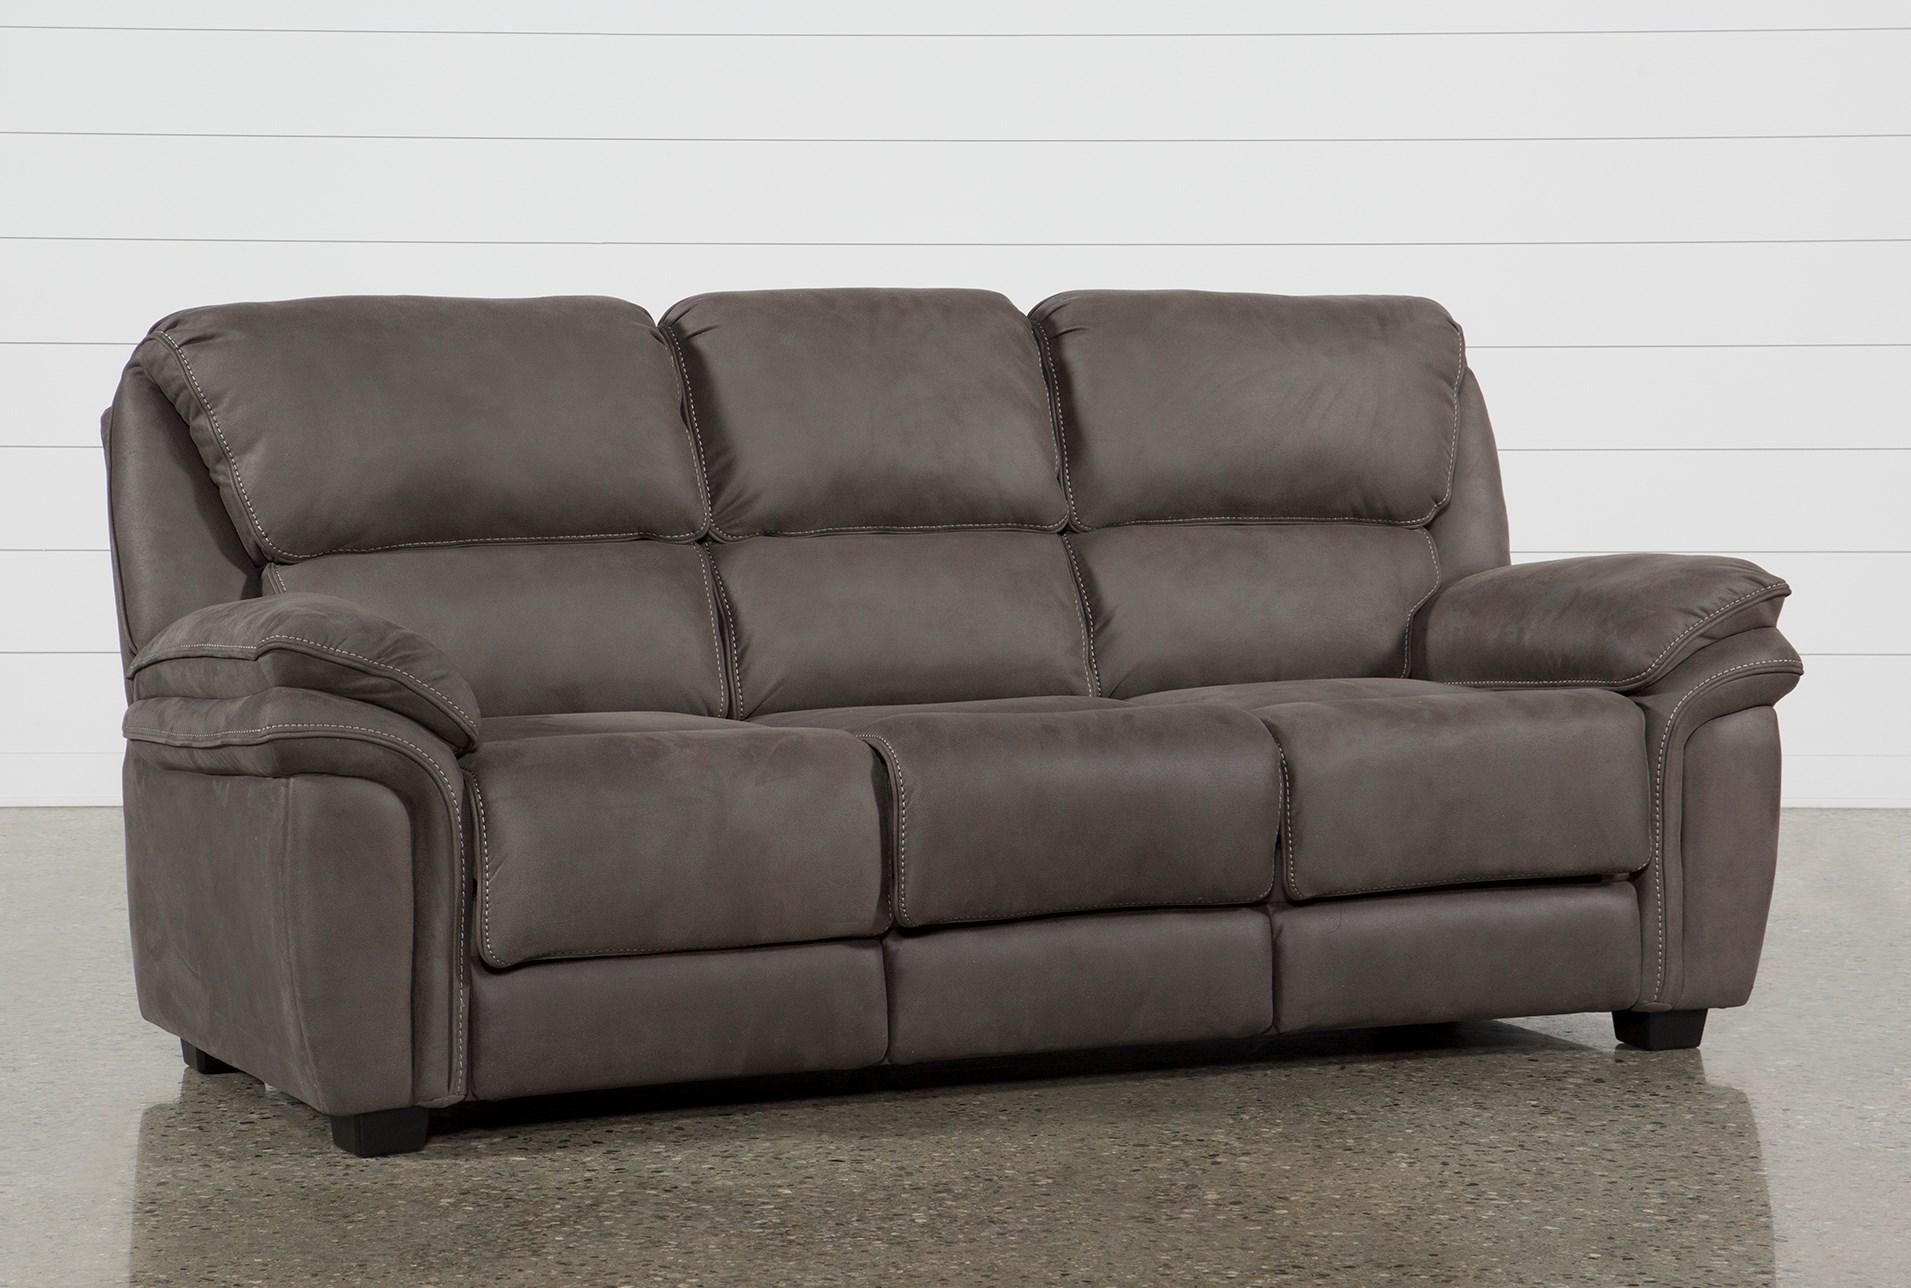 Marvelous Norfolk Grey Queen Sofa Sleeper Cjindustries Chair Design For Home Cjindustriesco